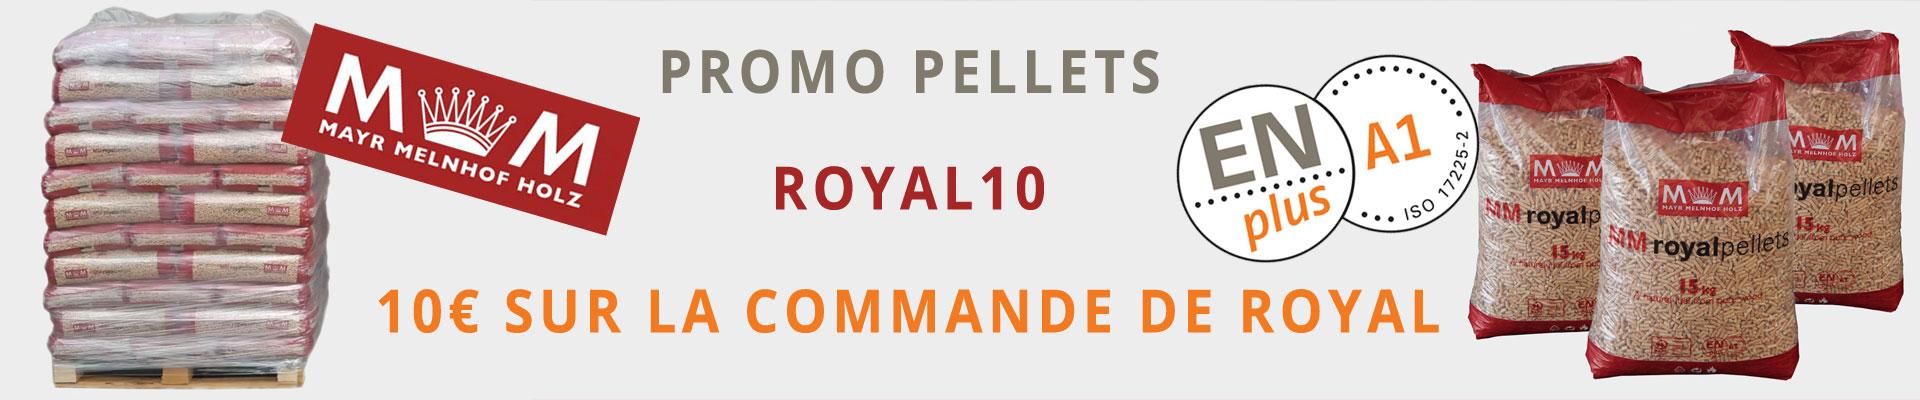 promo-pellets-royal-10-1920